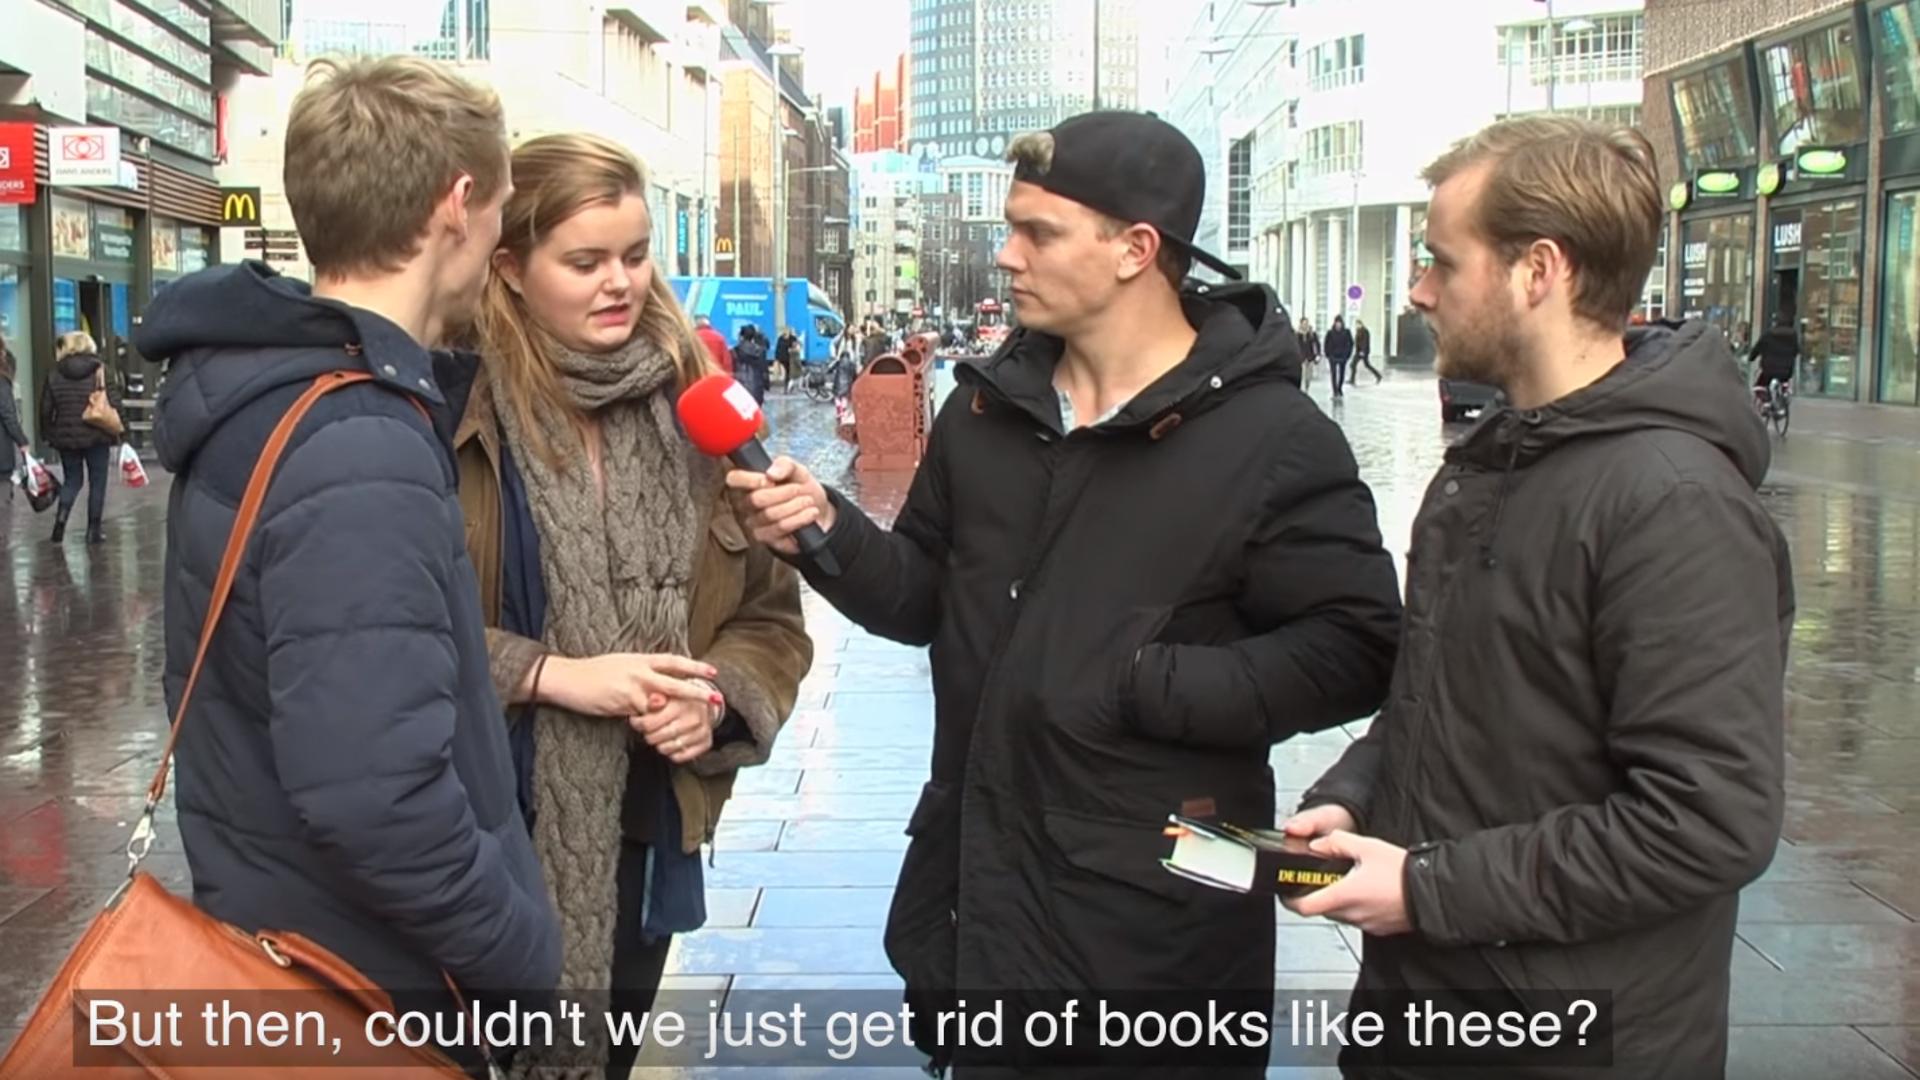 Straßenumfrage: Bibel vs. Koran.